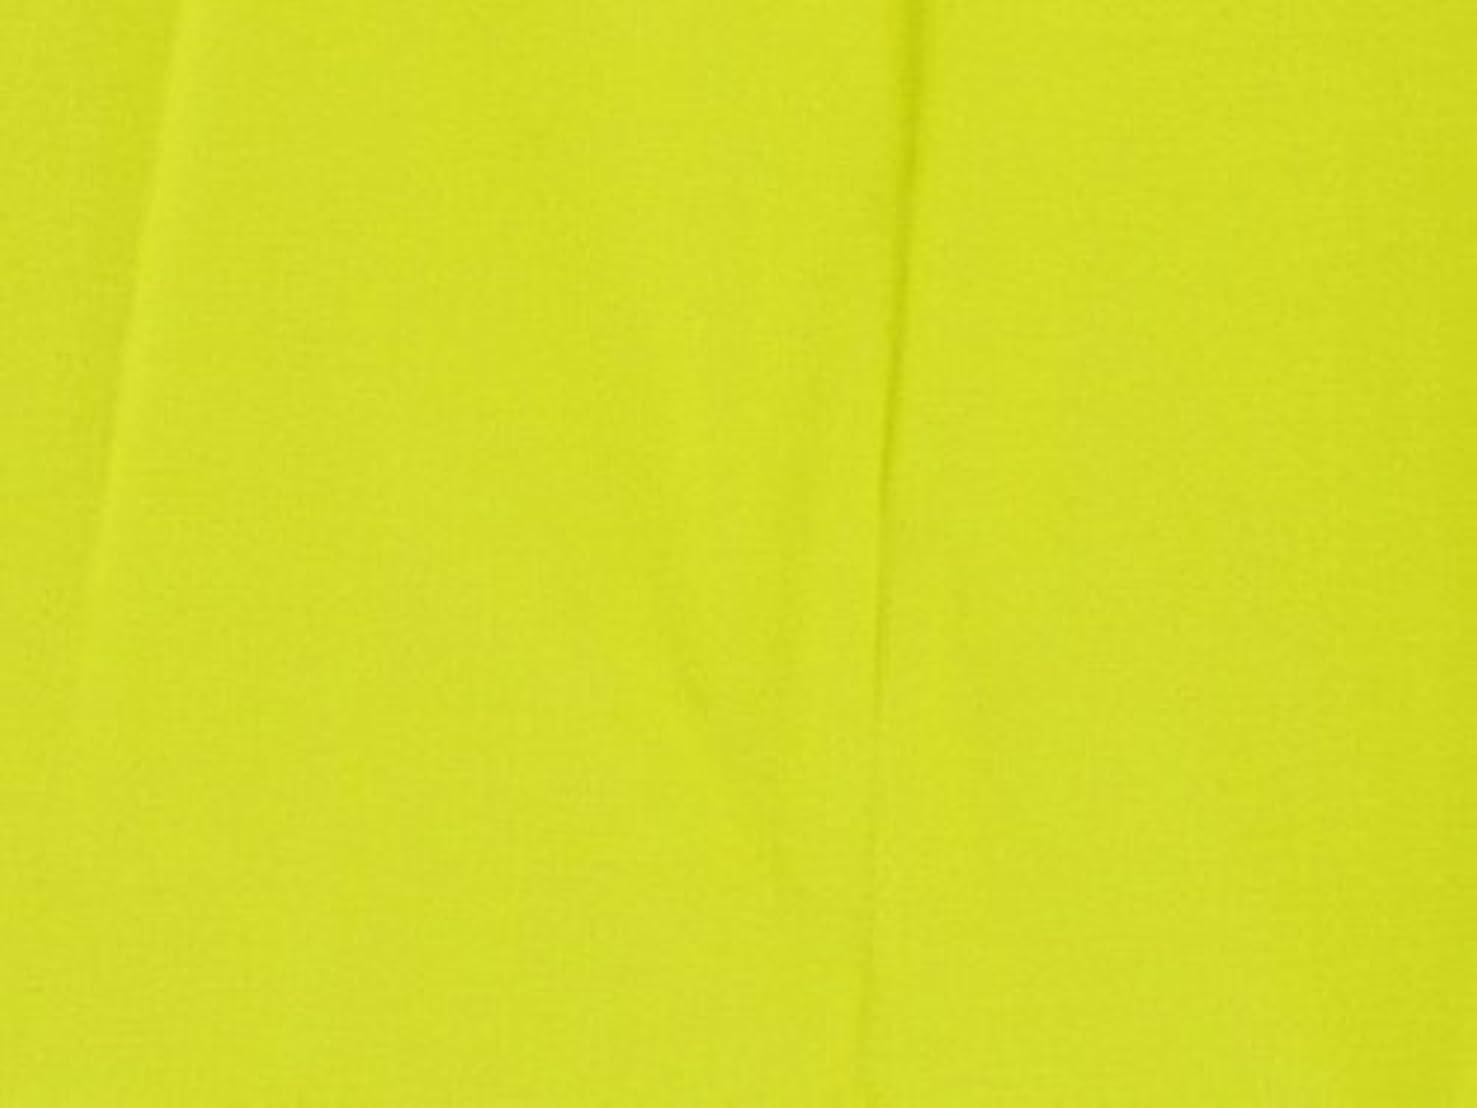 Dalston Mill Fabrics Plain Cotton Fabric, Yellow, 2m